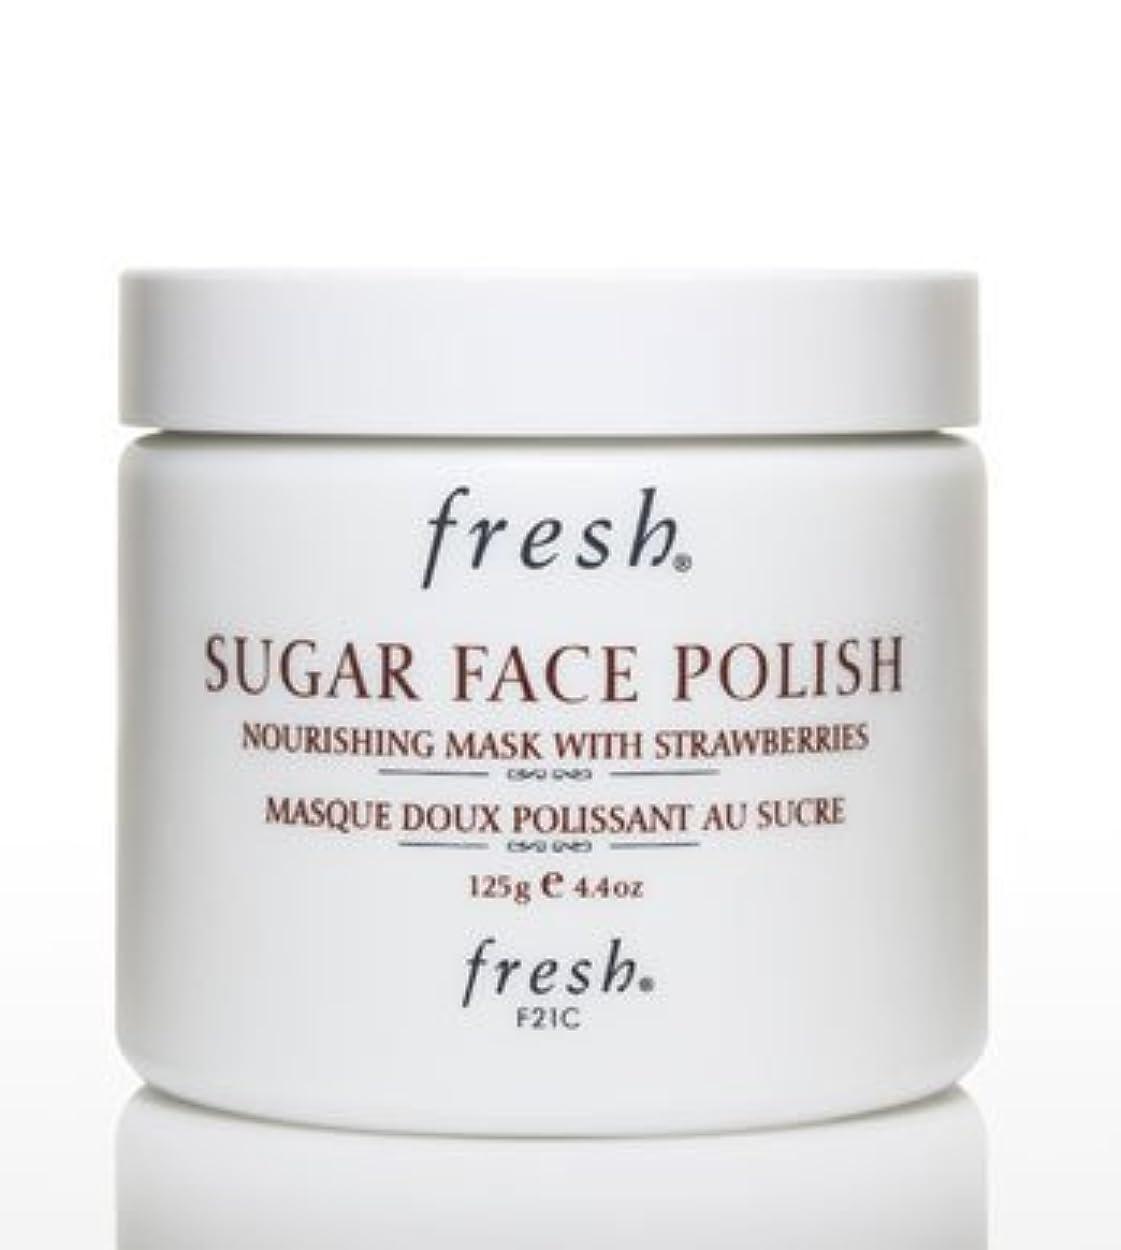 Fresh SUGAR FACE POLISH (フレッシュ シュガーフェイスポリッシュ) 4.2 oz (125g) by Fresh for Women